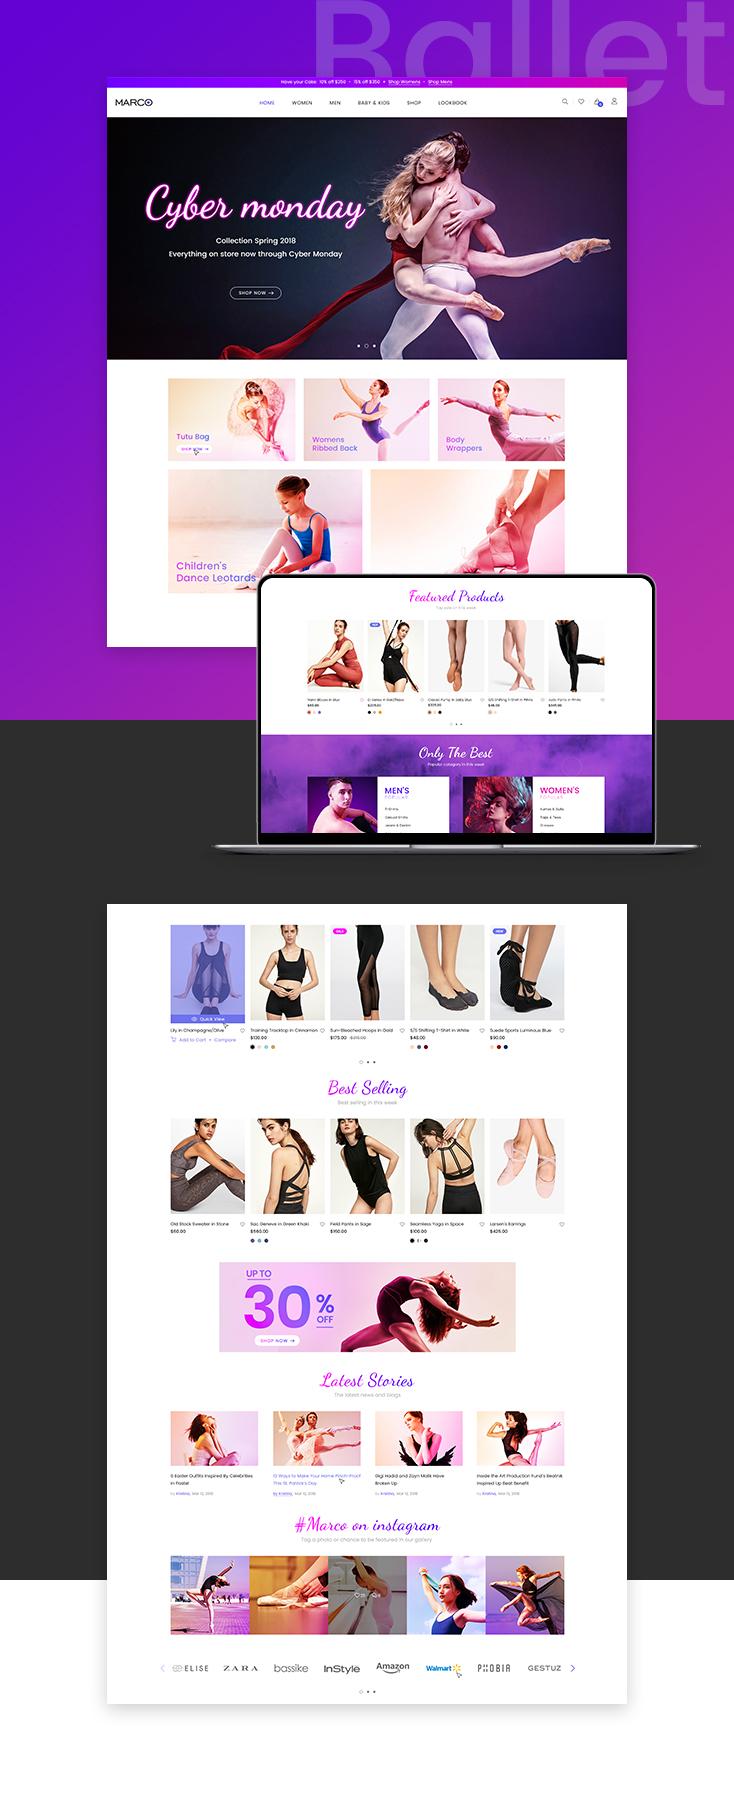 Marco Ballet Shopify theme design